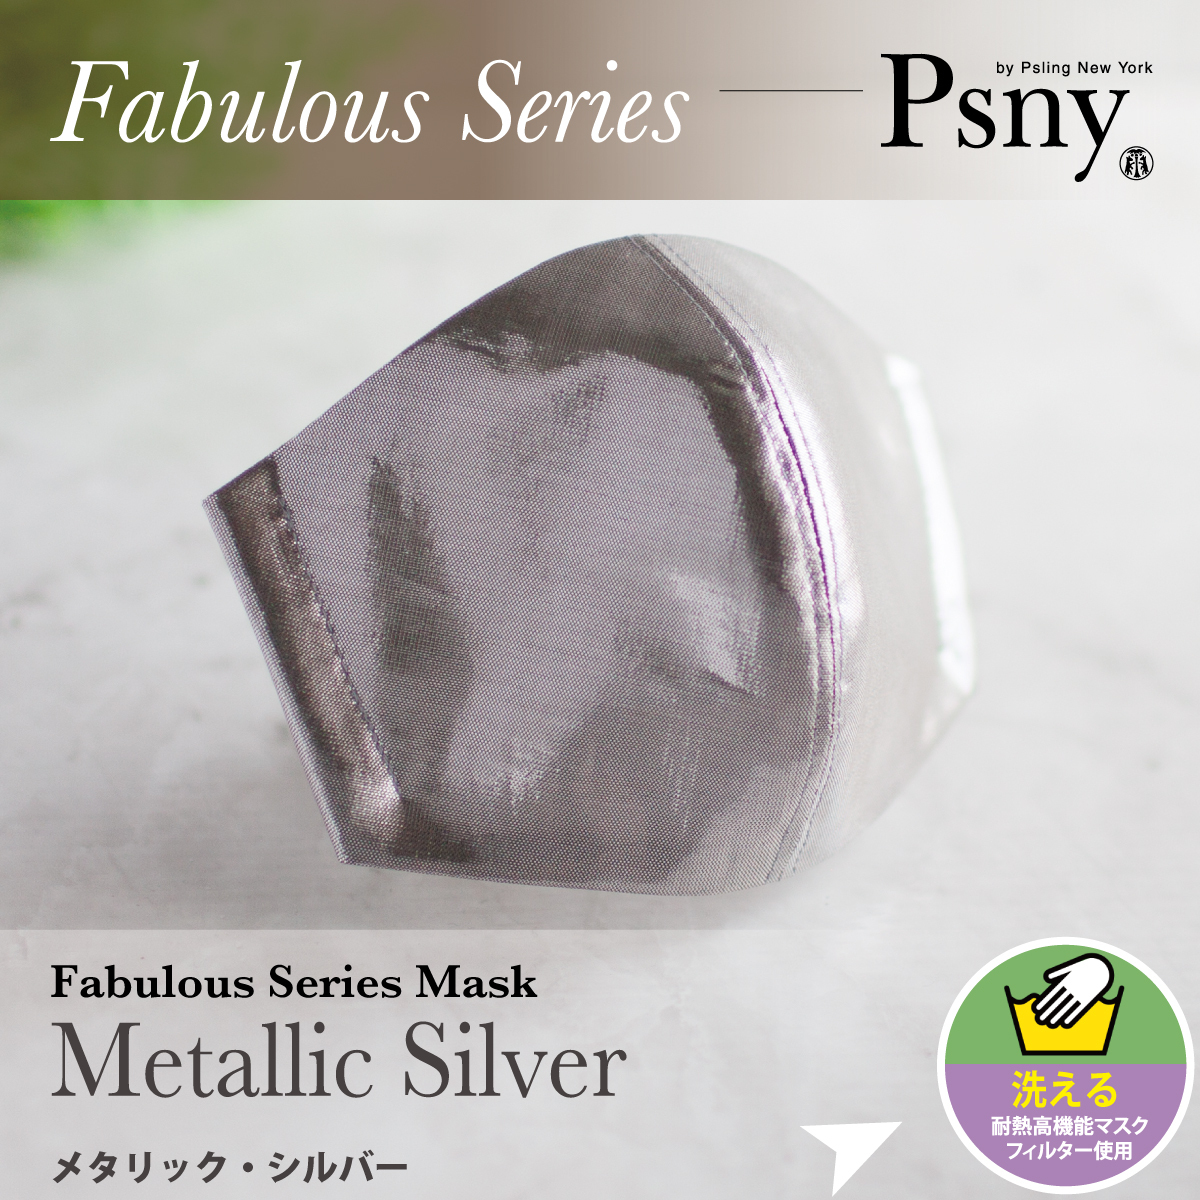 PSNY ファビュラス・シルバー・オーガンジー 花粉 黄砂 洗える不織布フィルター入り 立体 大人用 マスク 送料無料 F09